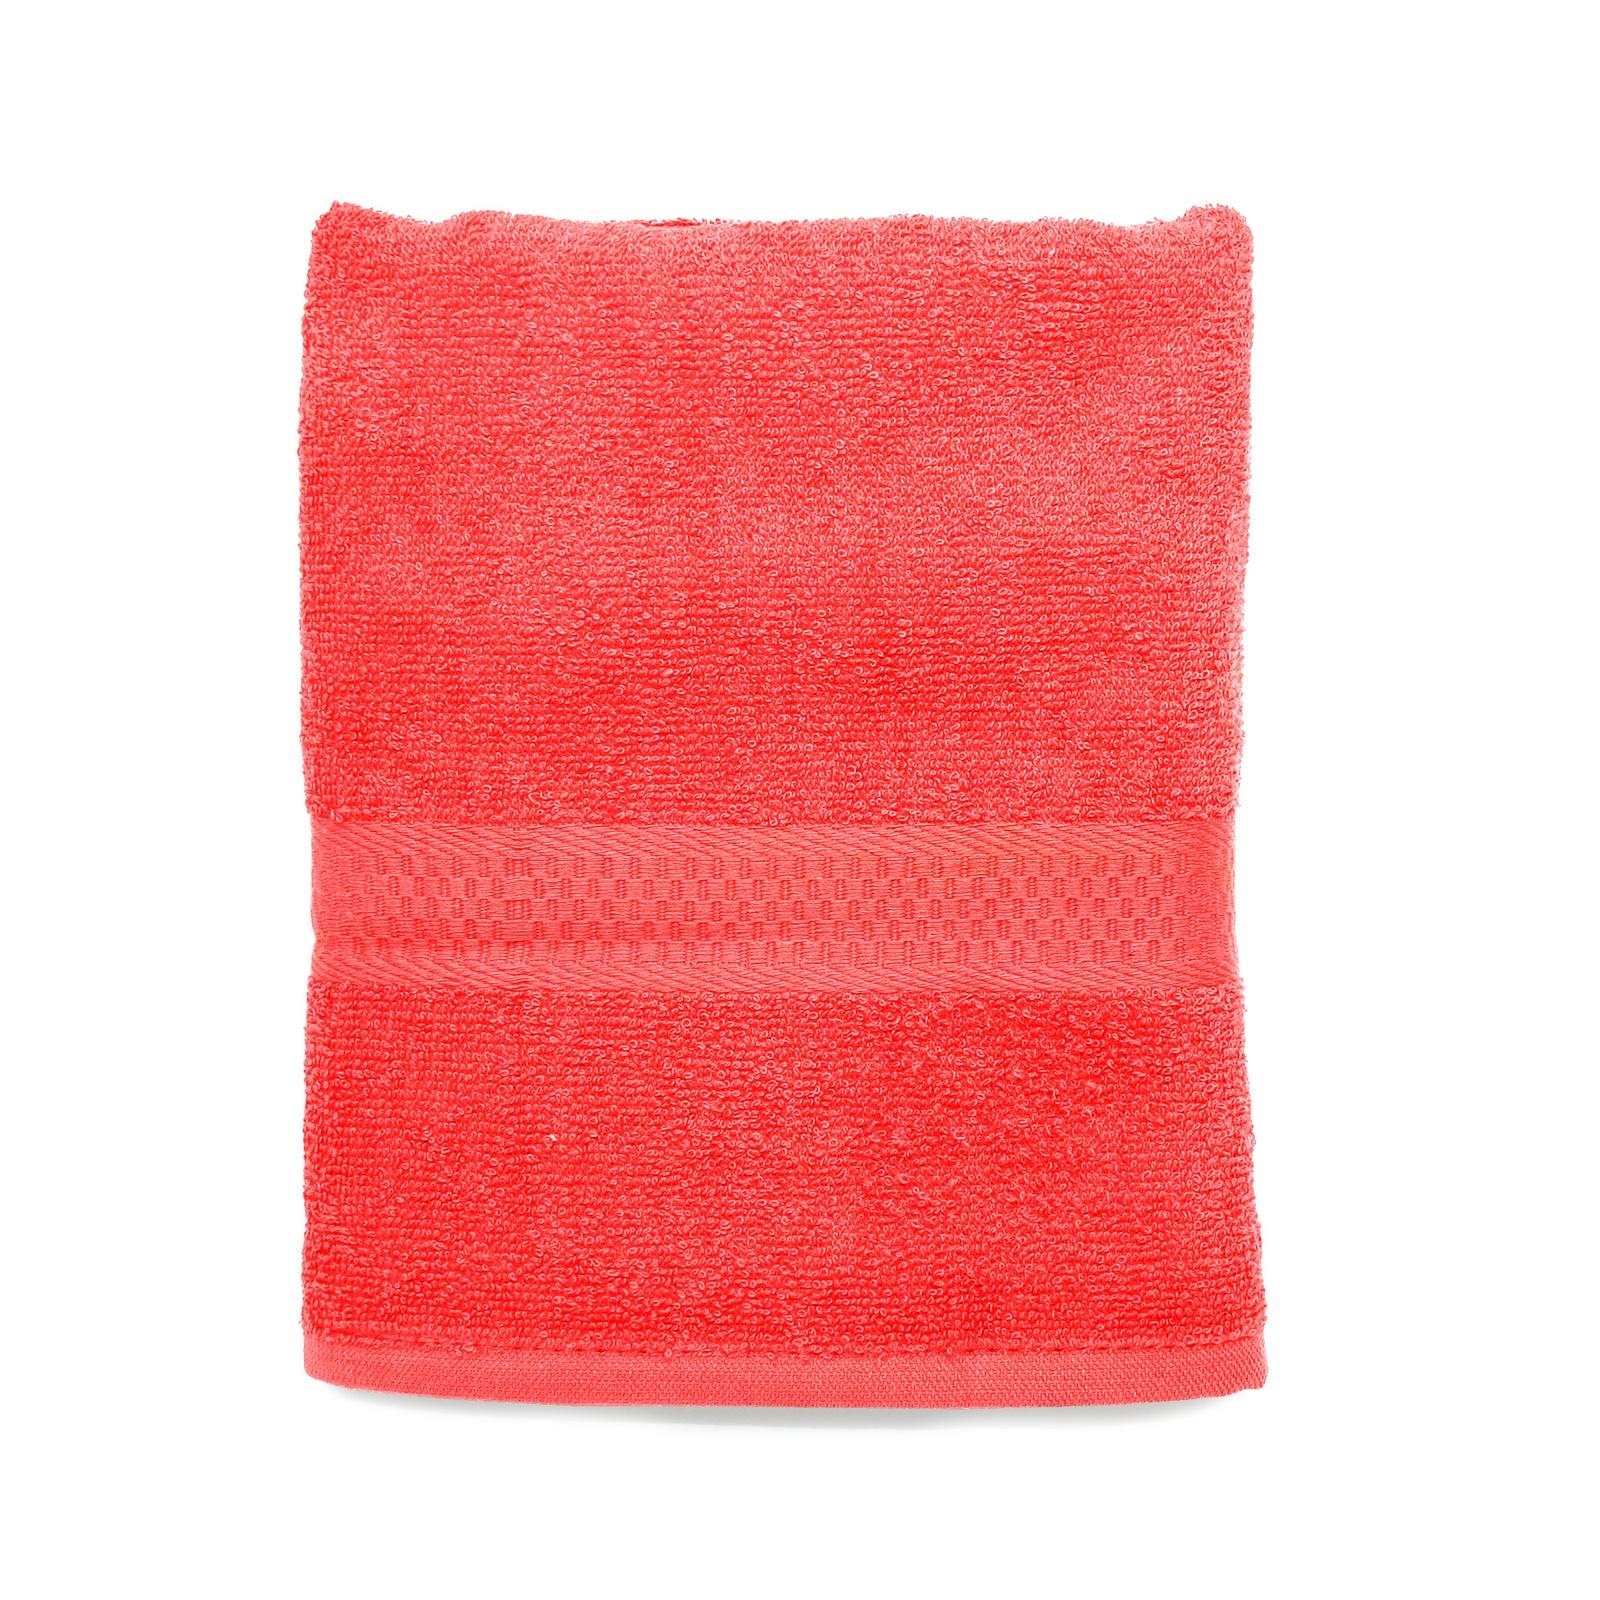 цена на Полотенце банное Spany, 21311318192, махровое, красный, 70 х 130 см